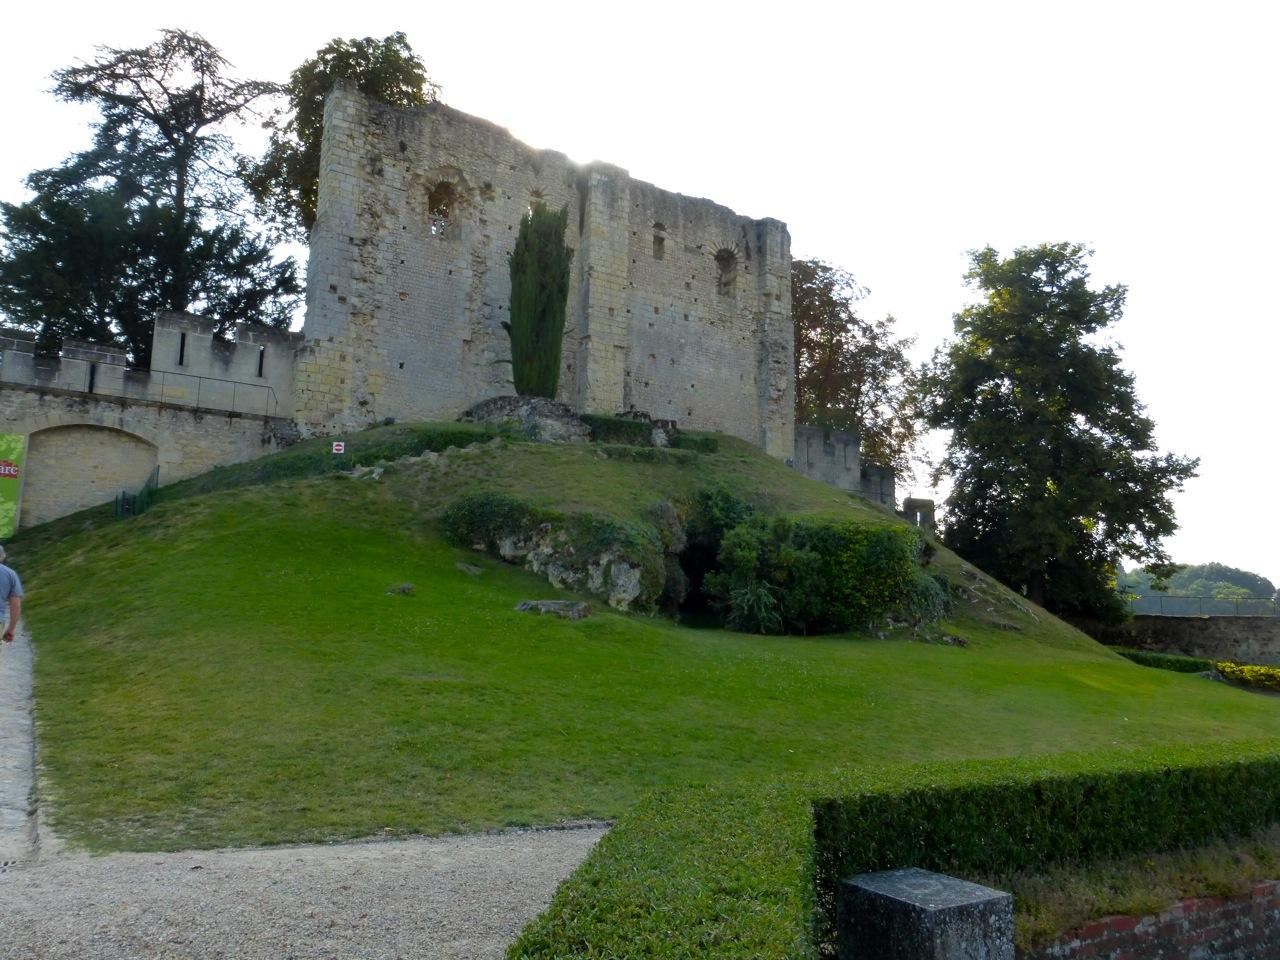 CHÂTEAU DE LANGEAIS 1